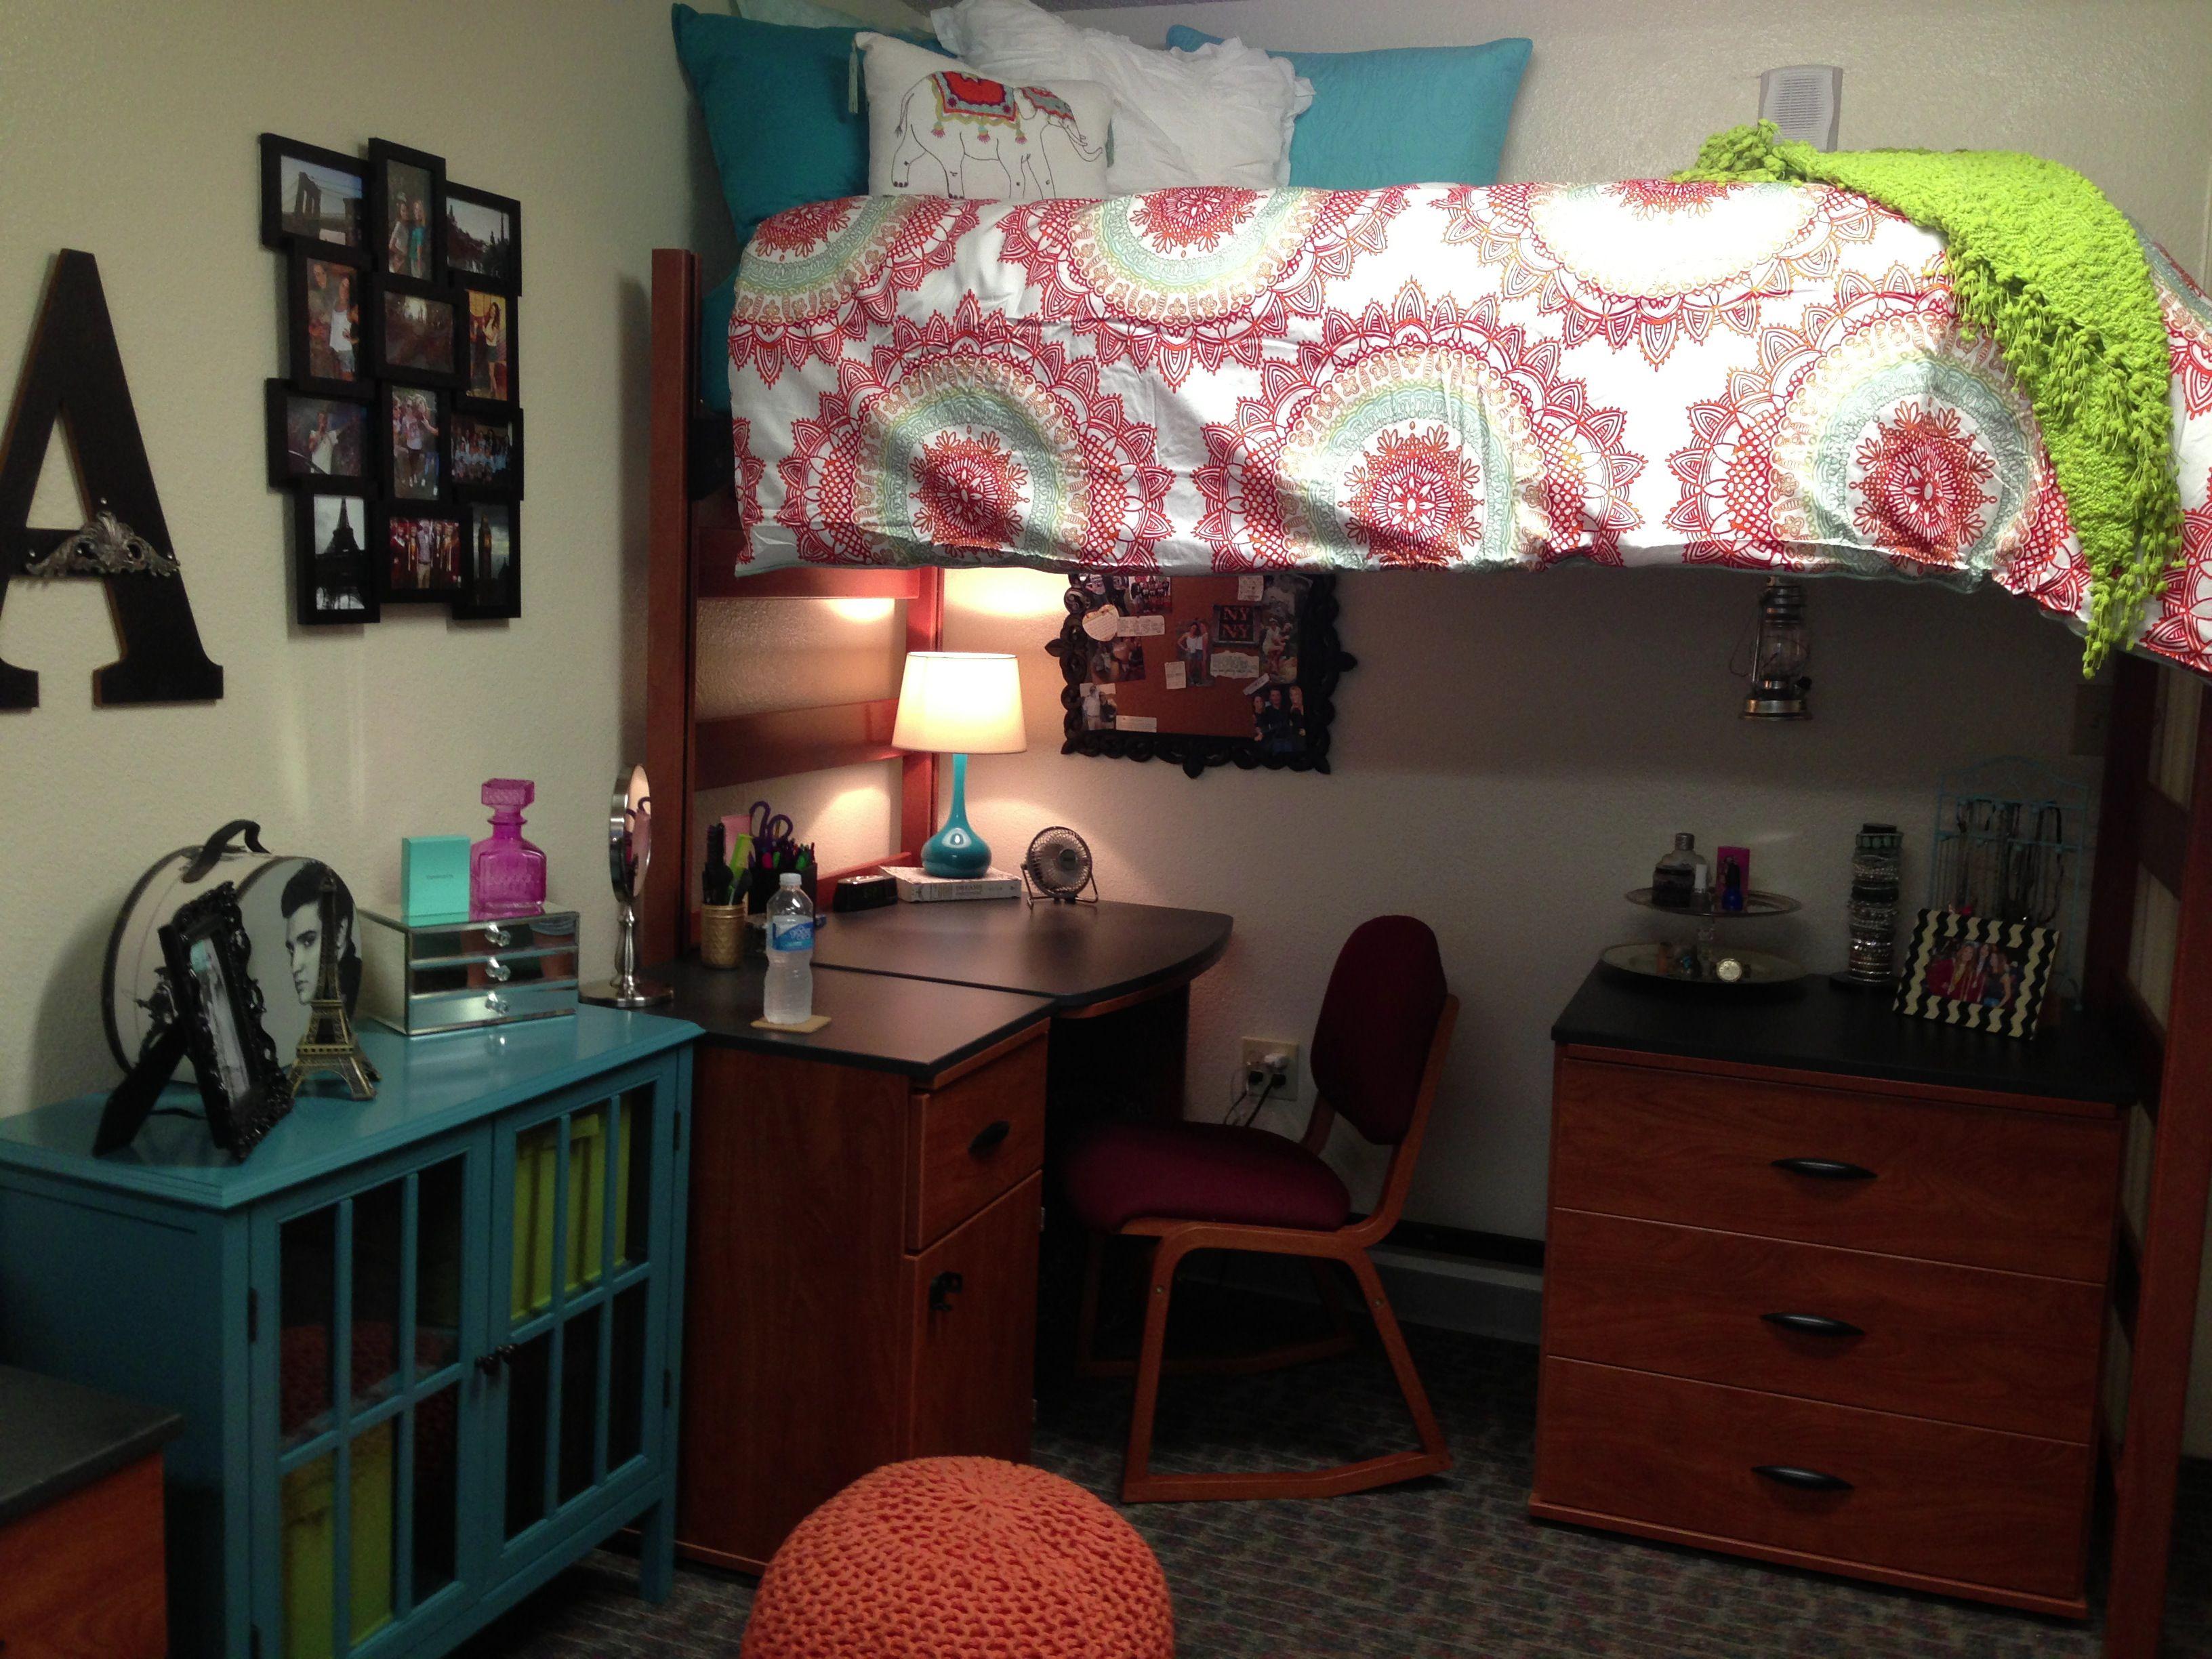 Desk/chair/dresser Underneath Top Bunk Bed  White Bedspread W Circle Tie